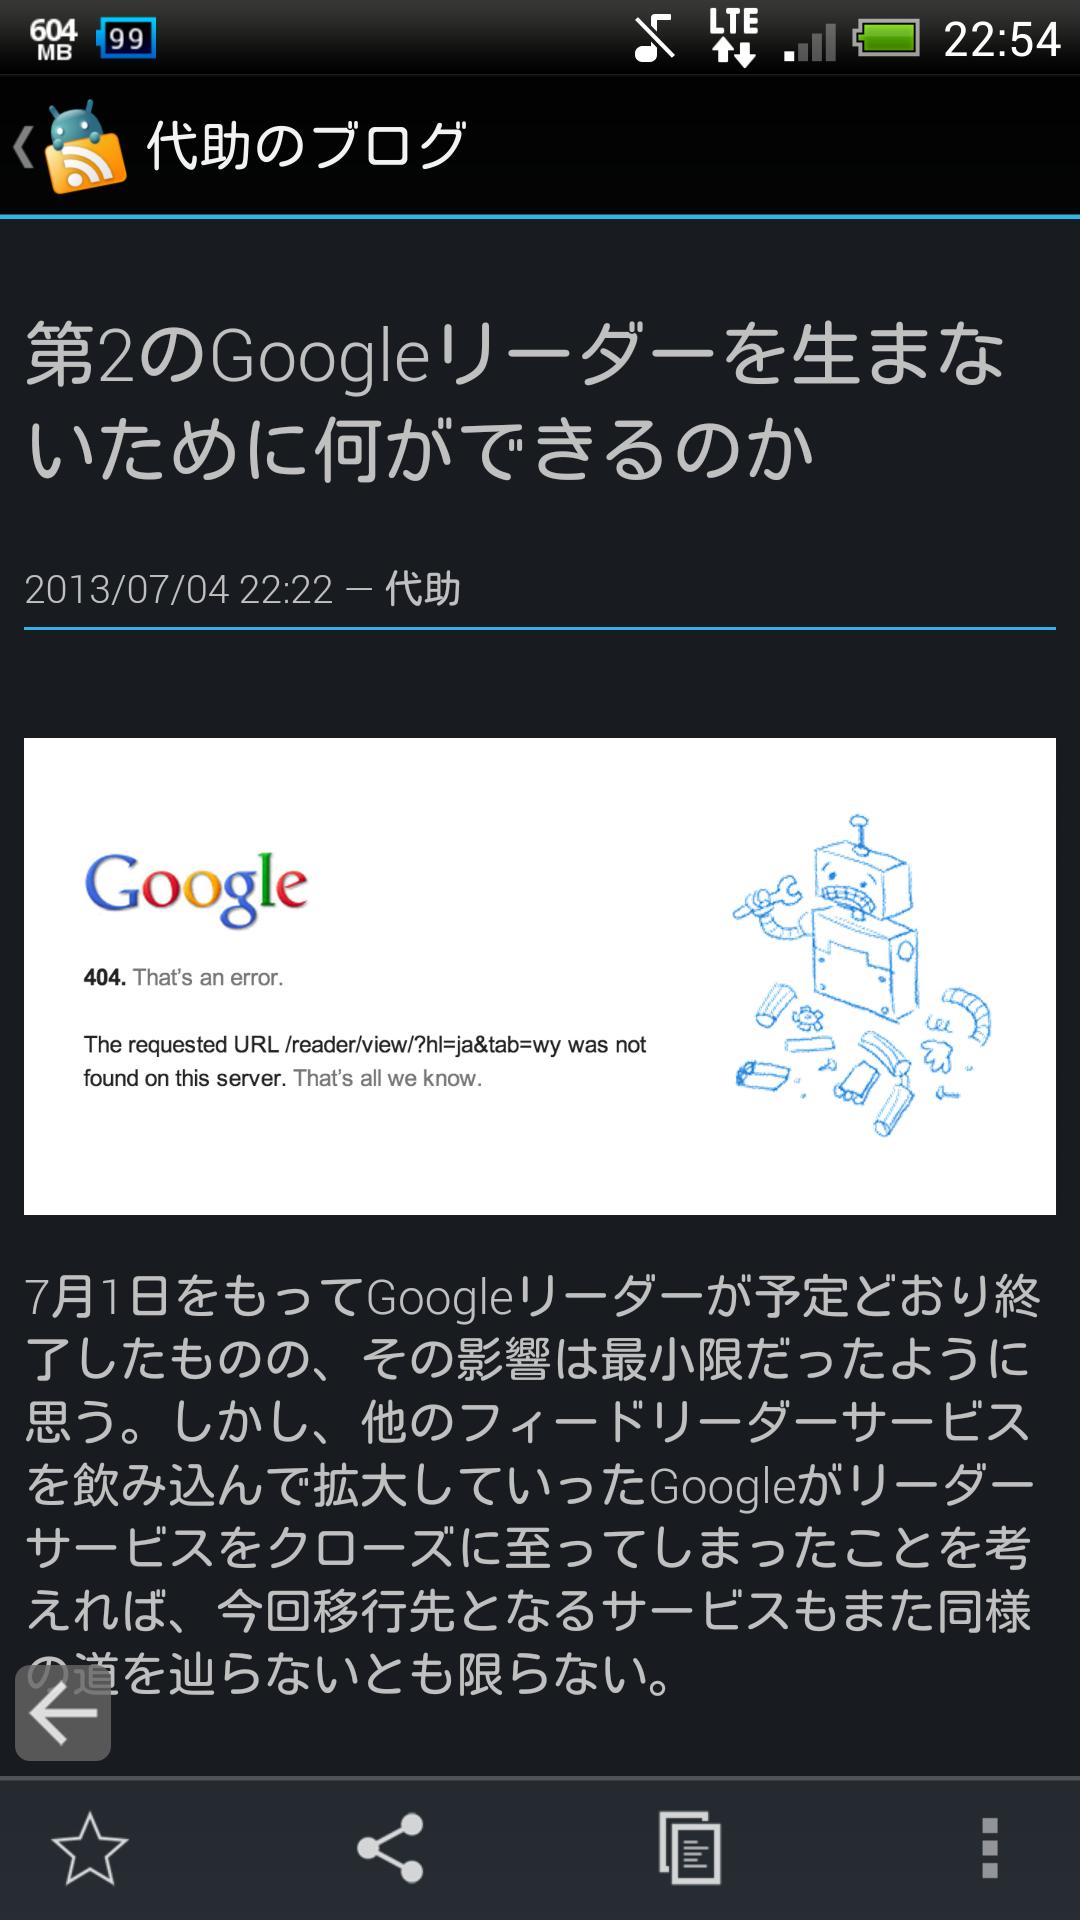 Screenshot_2013-07-10-22-54-18.png